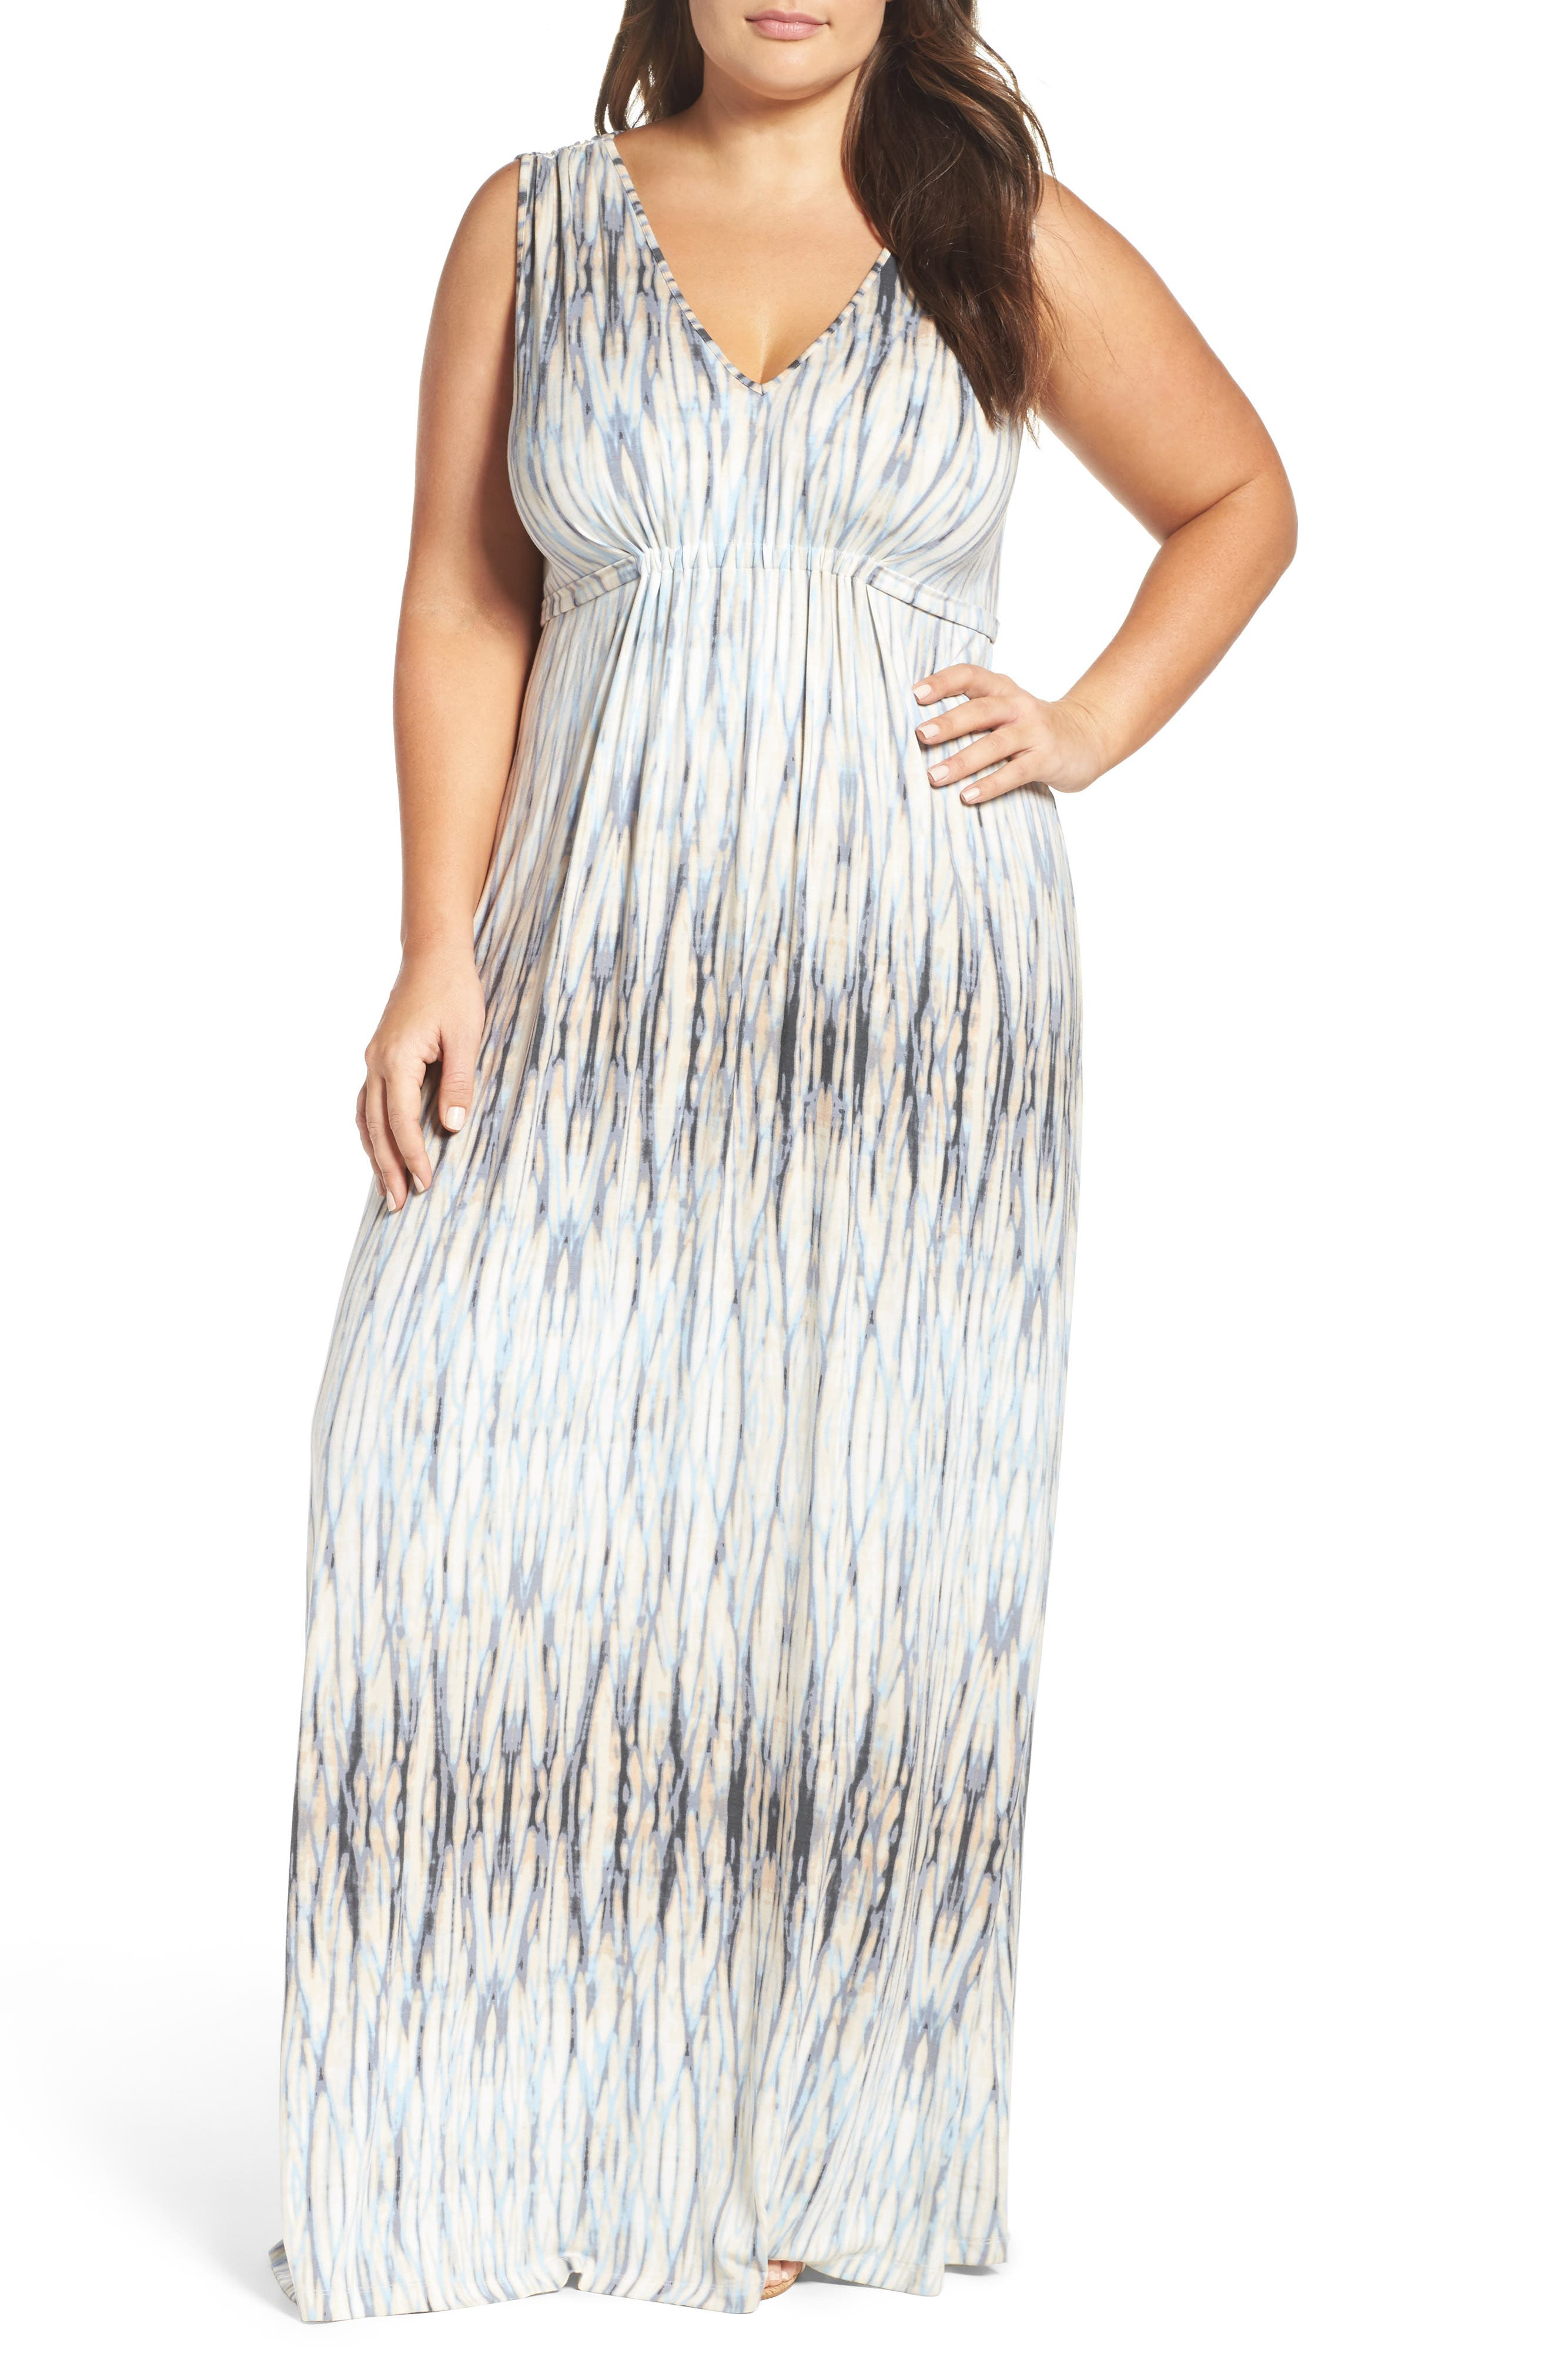 Grecia Sleeveless Jersey Maxi Dress,                         Main,                         color, Water Reflections